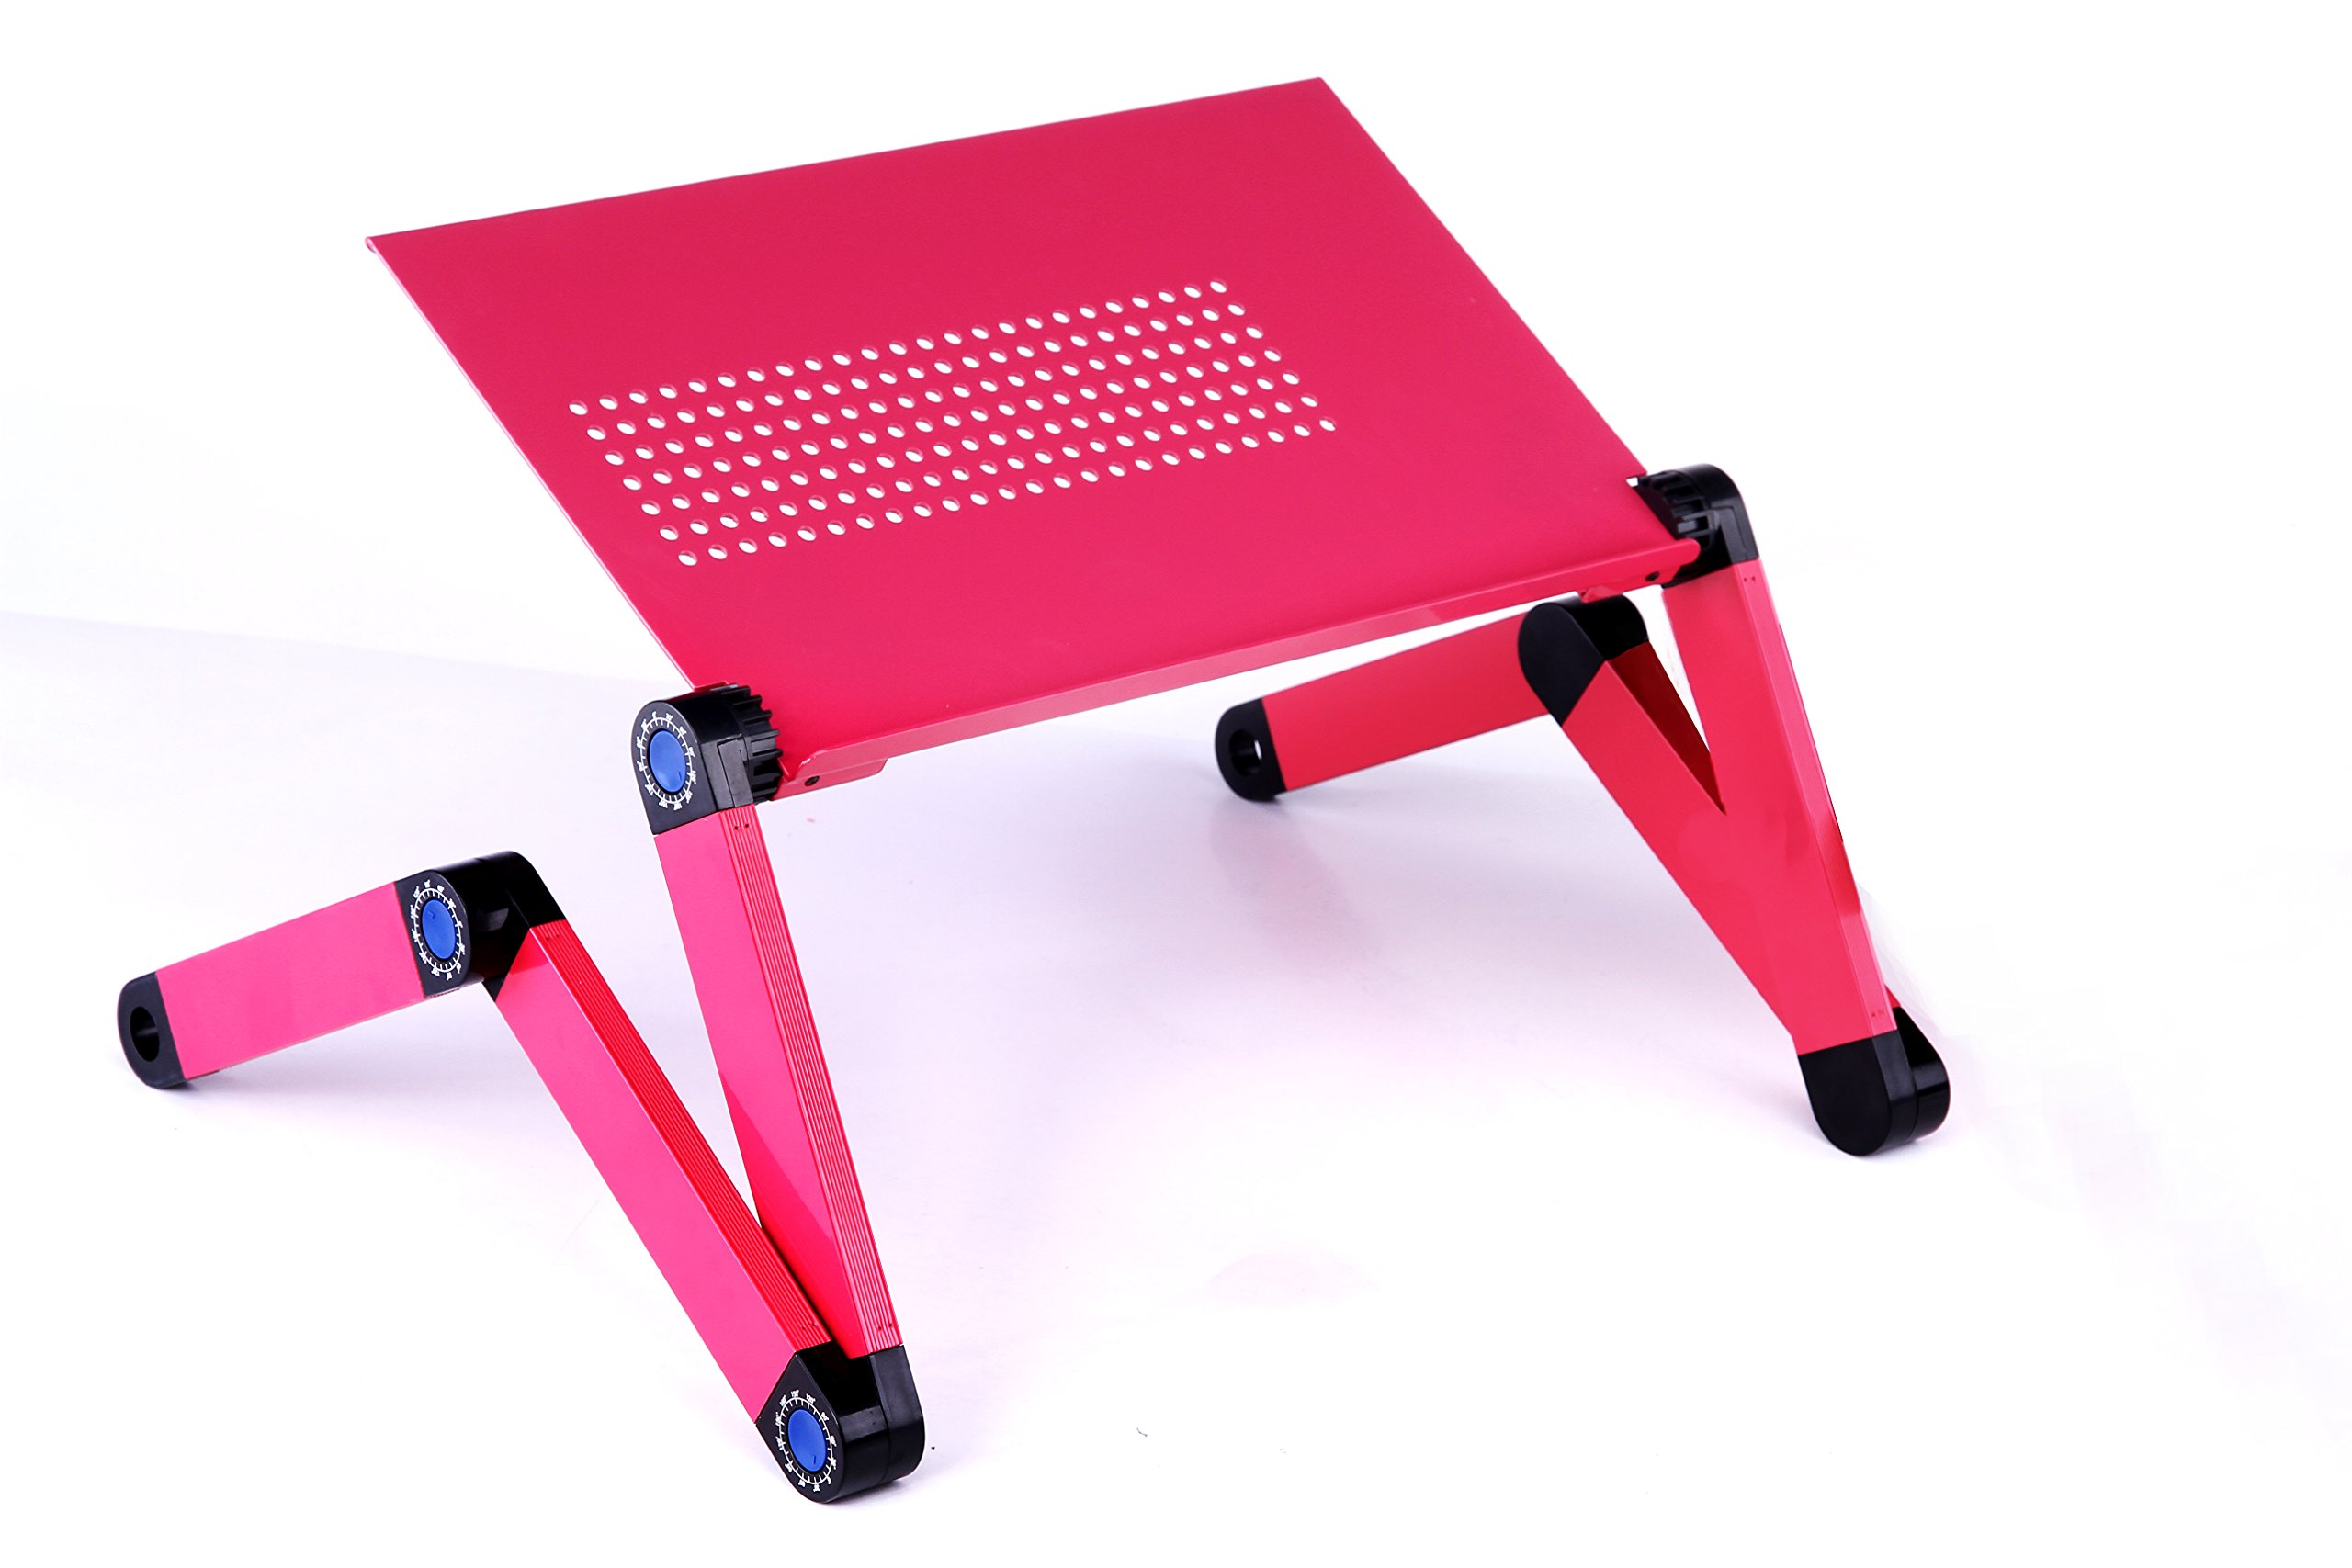 BABY FROG DESK (PINK) - Affordable standing desk, Folding camping desk, Portable table, Breakfast tray, Adjustable reading stand, Cookbook stand, Ergonomic desk, Boost productivity